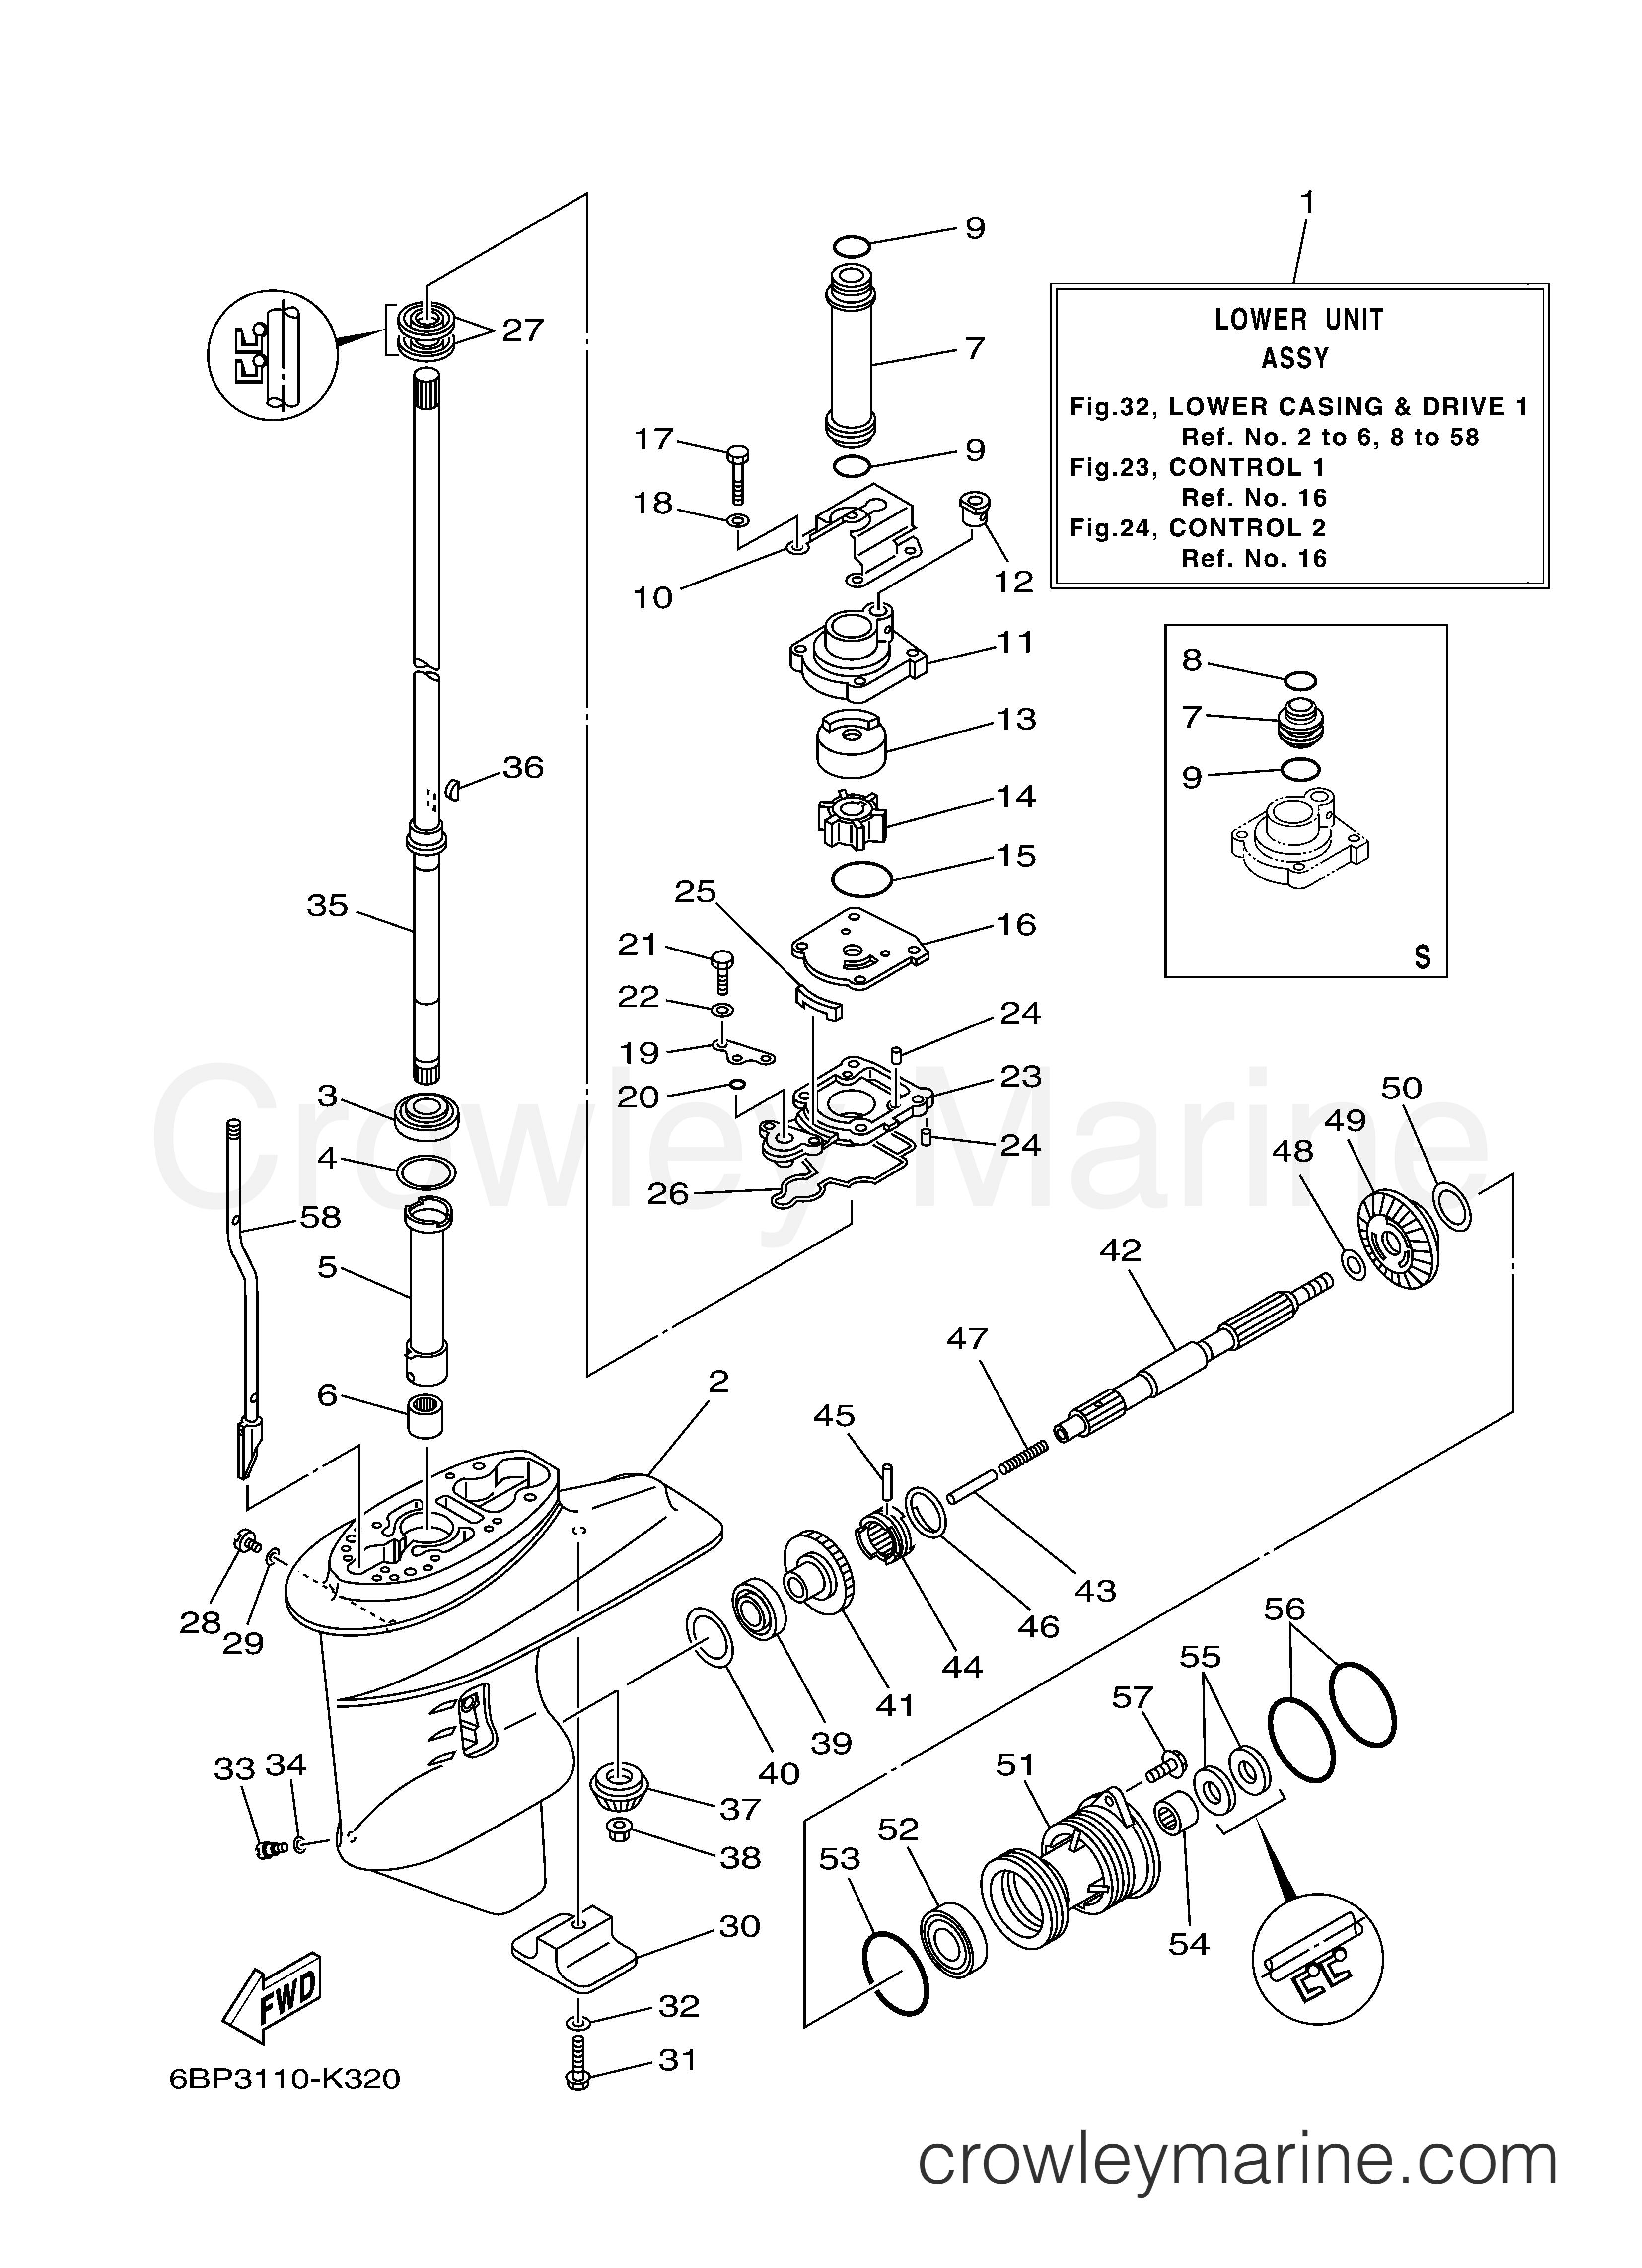 25 hp mercury lower unit parts diagram  u2022 wiring diagram